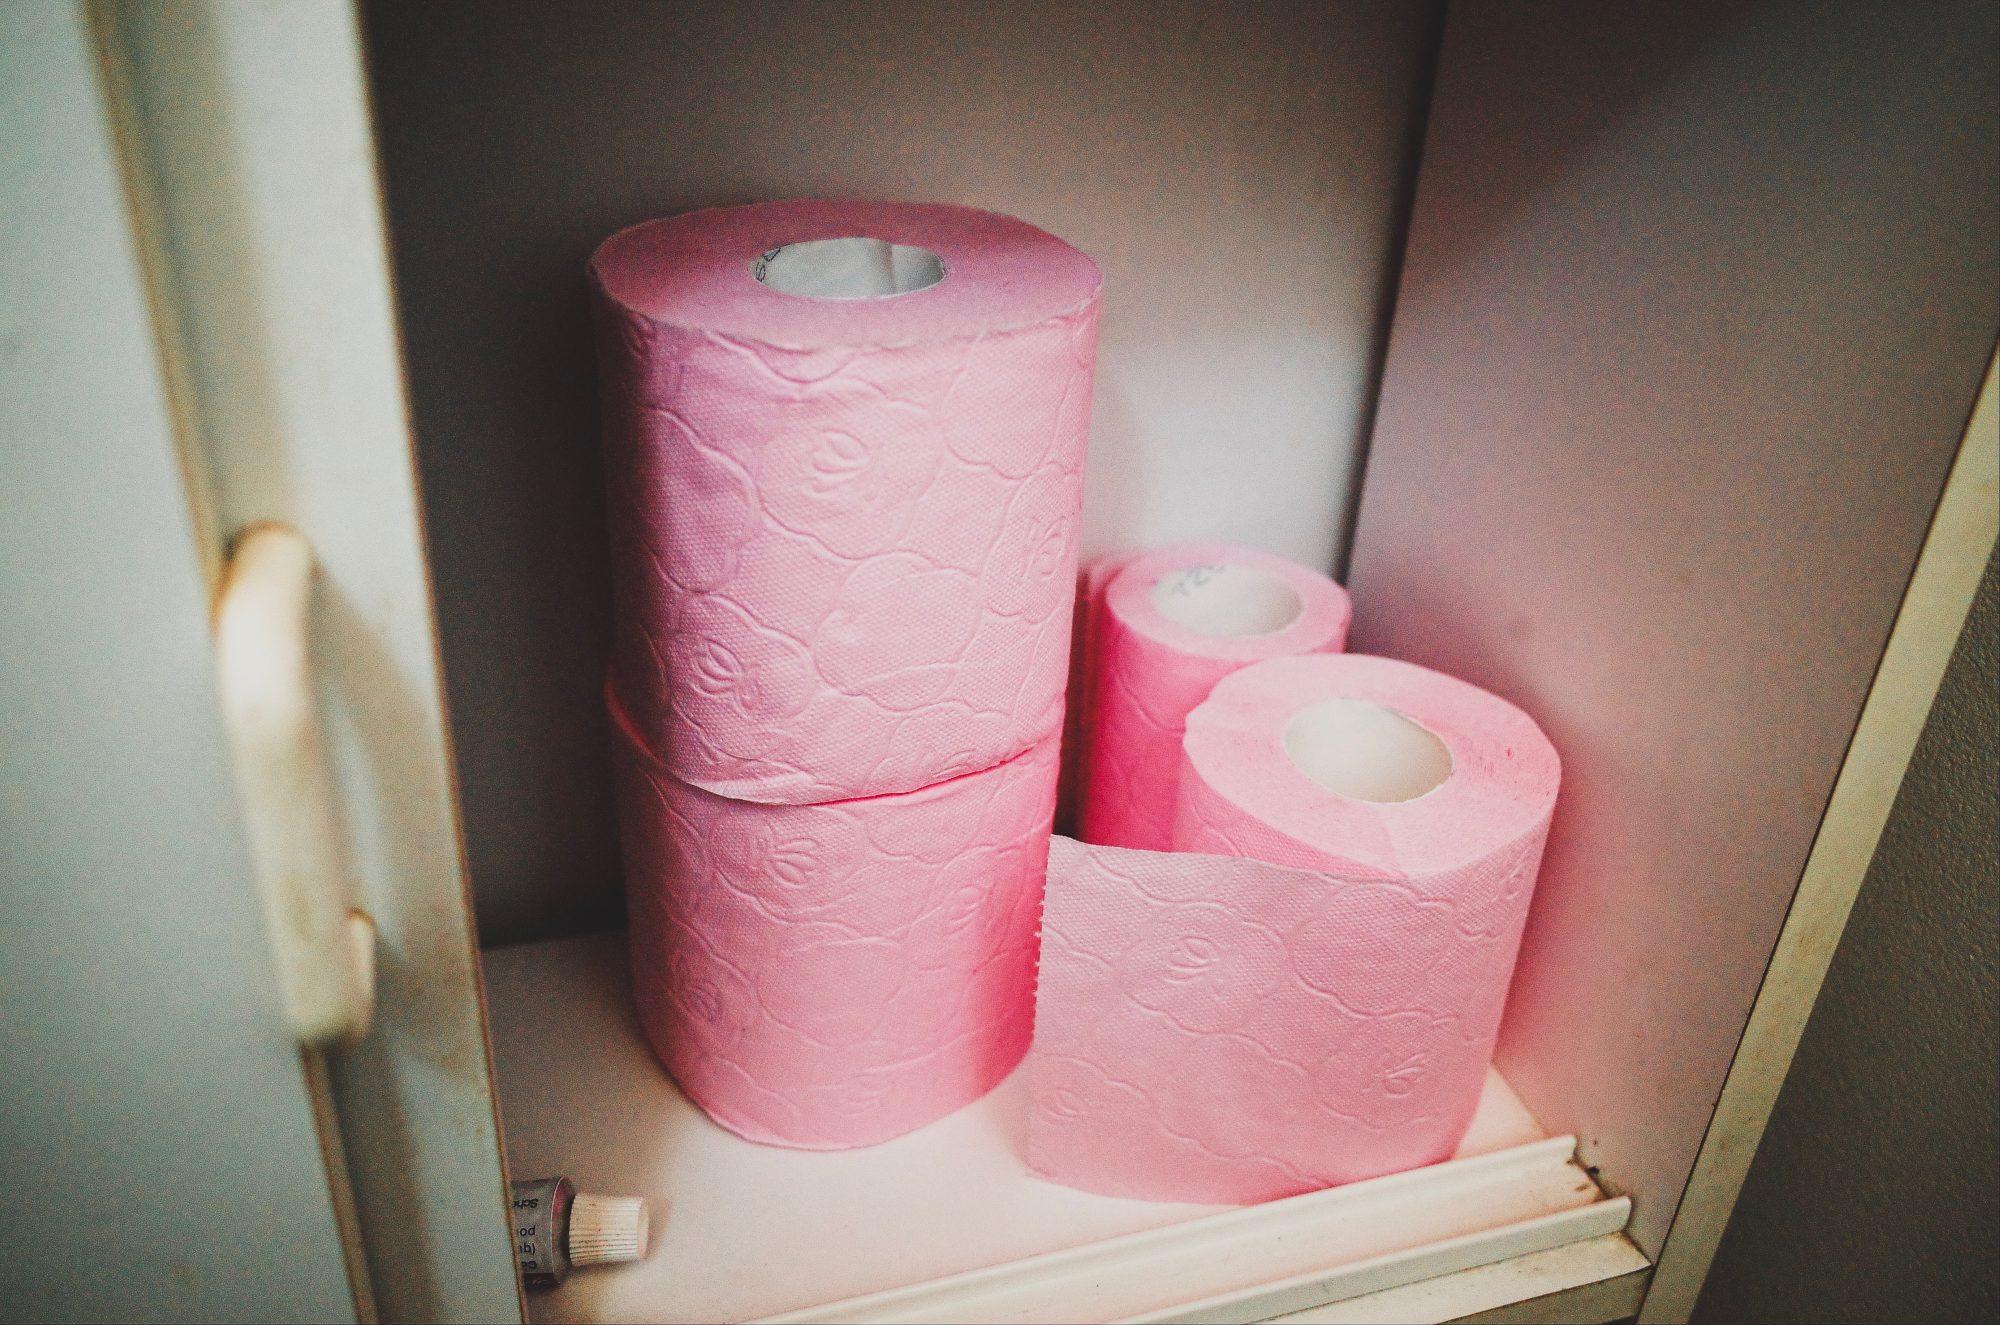 Pink toilet paper. Marseille, 2017